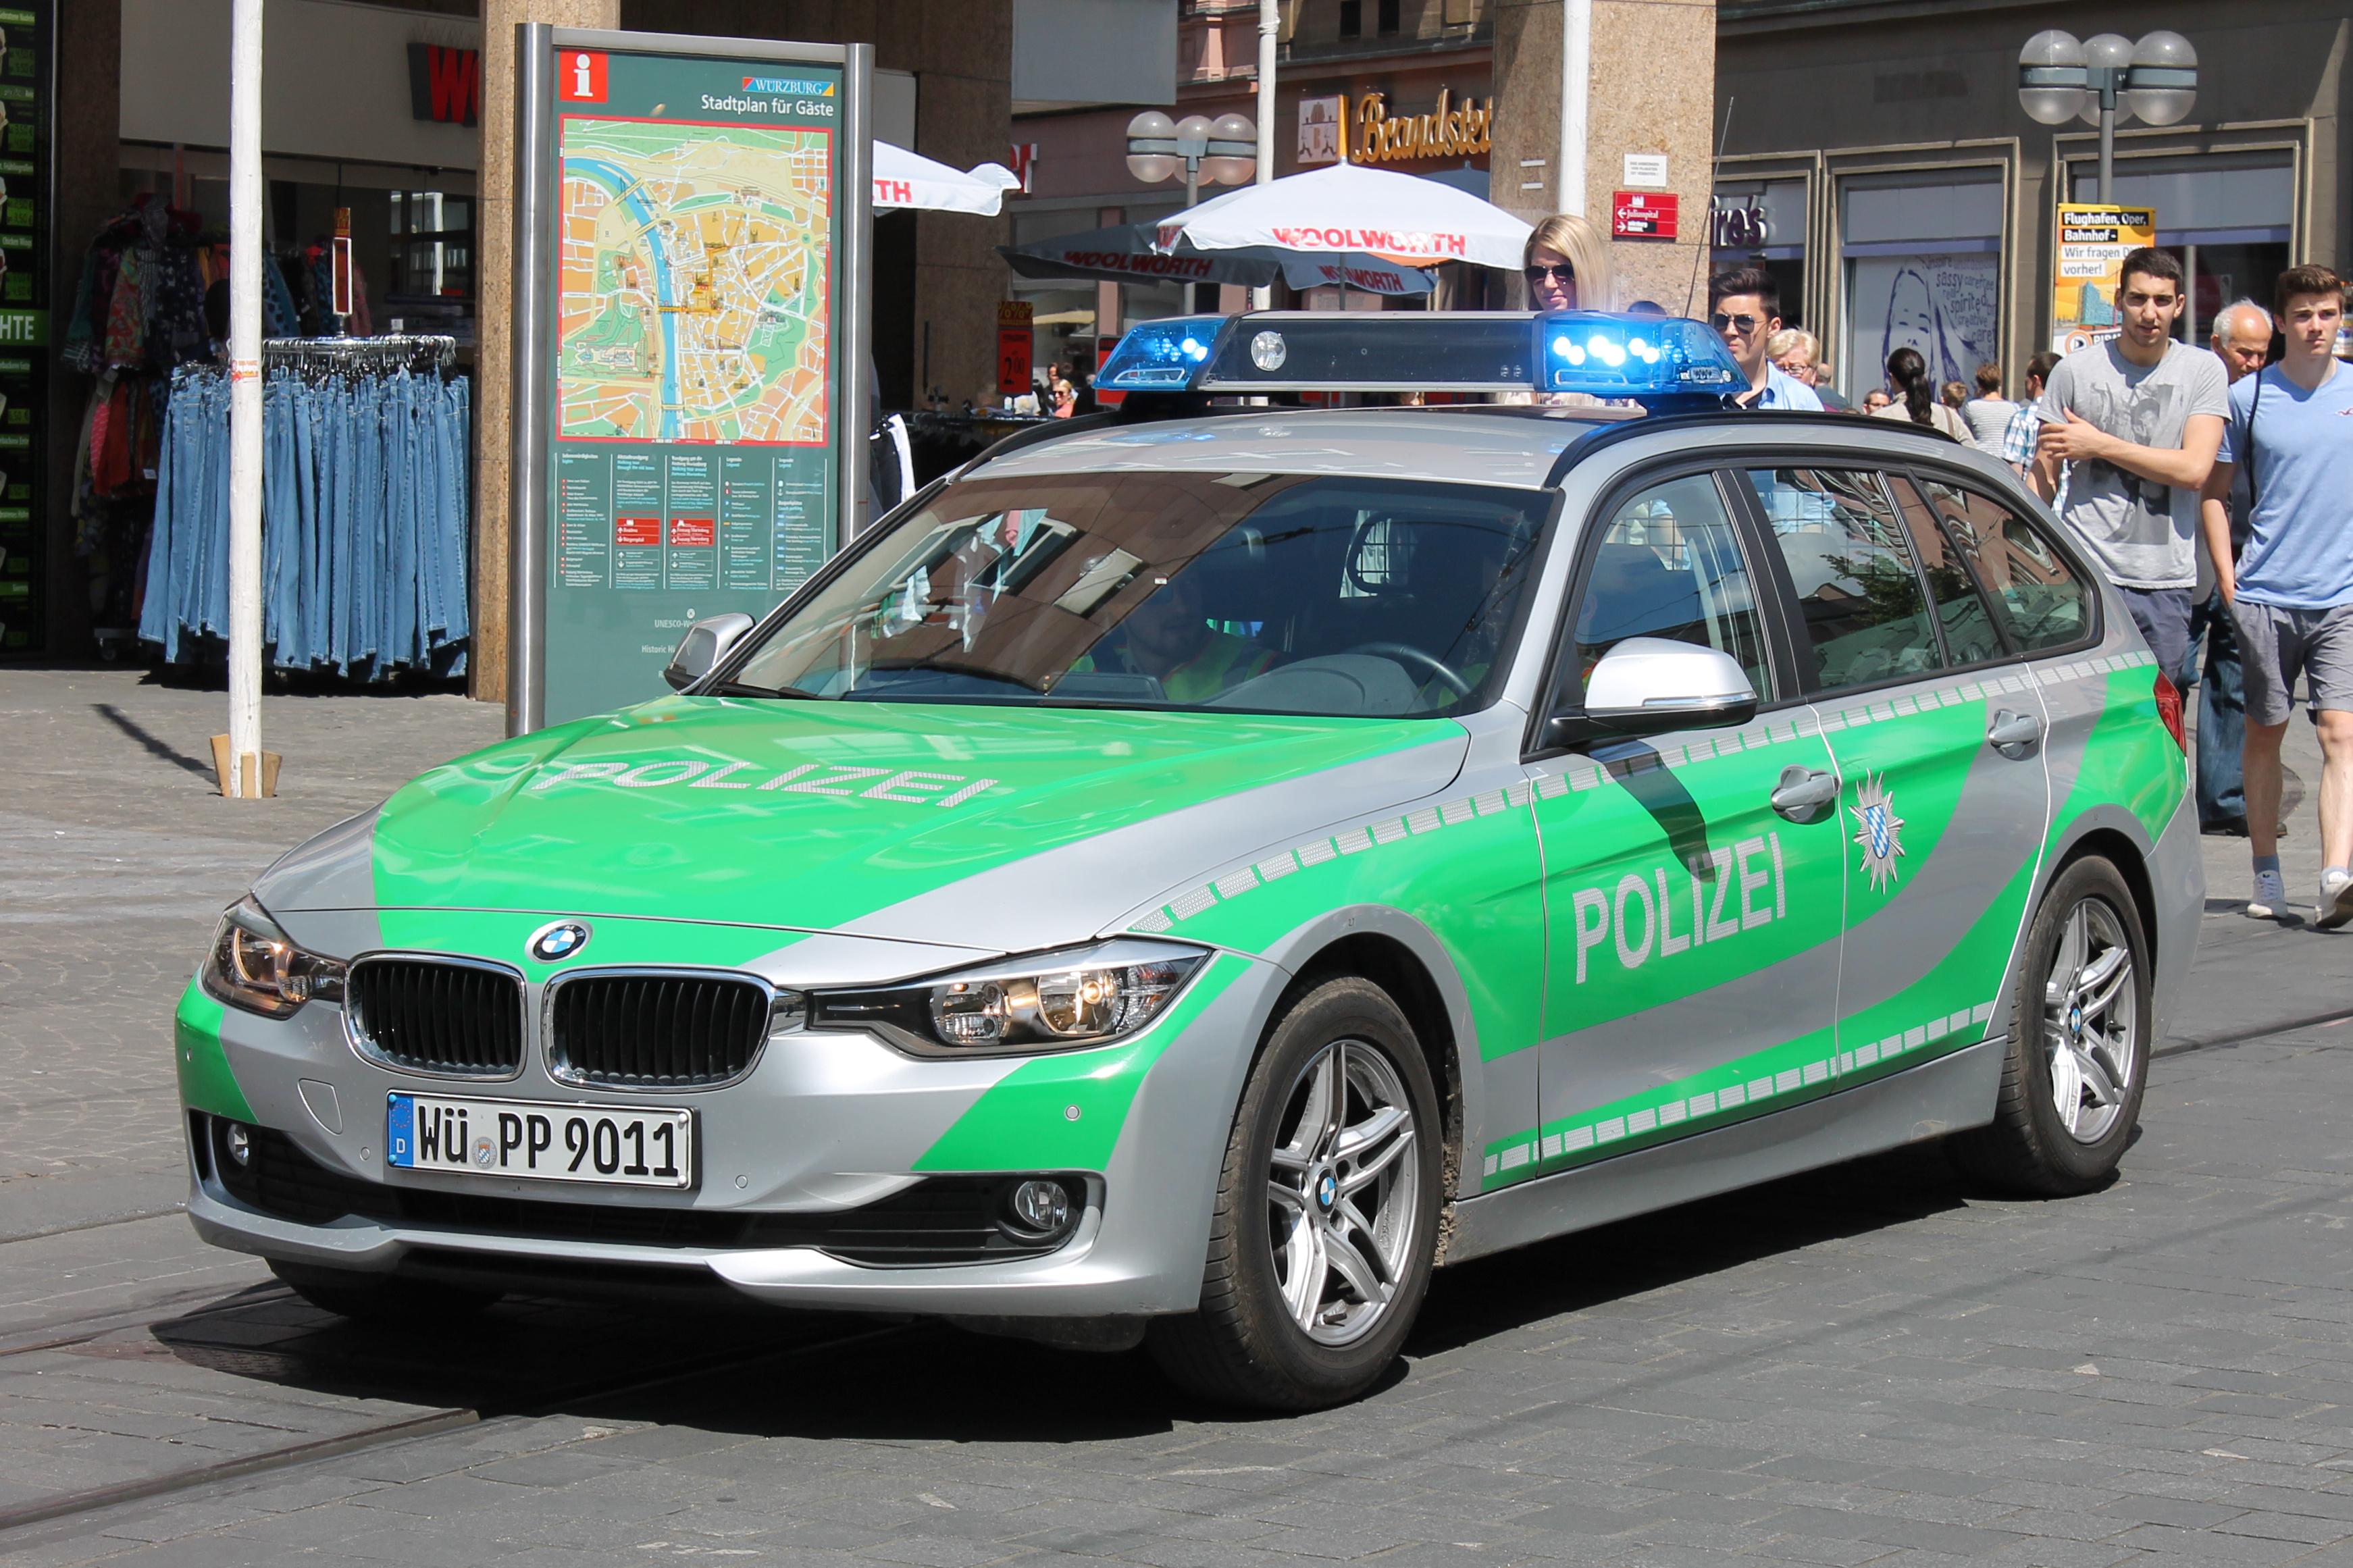 Polizei Bayern – Wikipedia